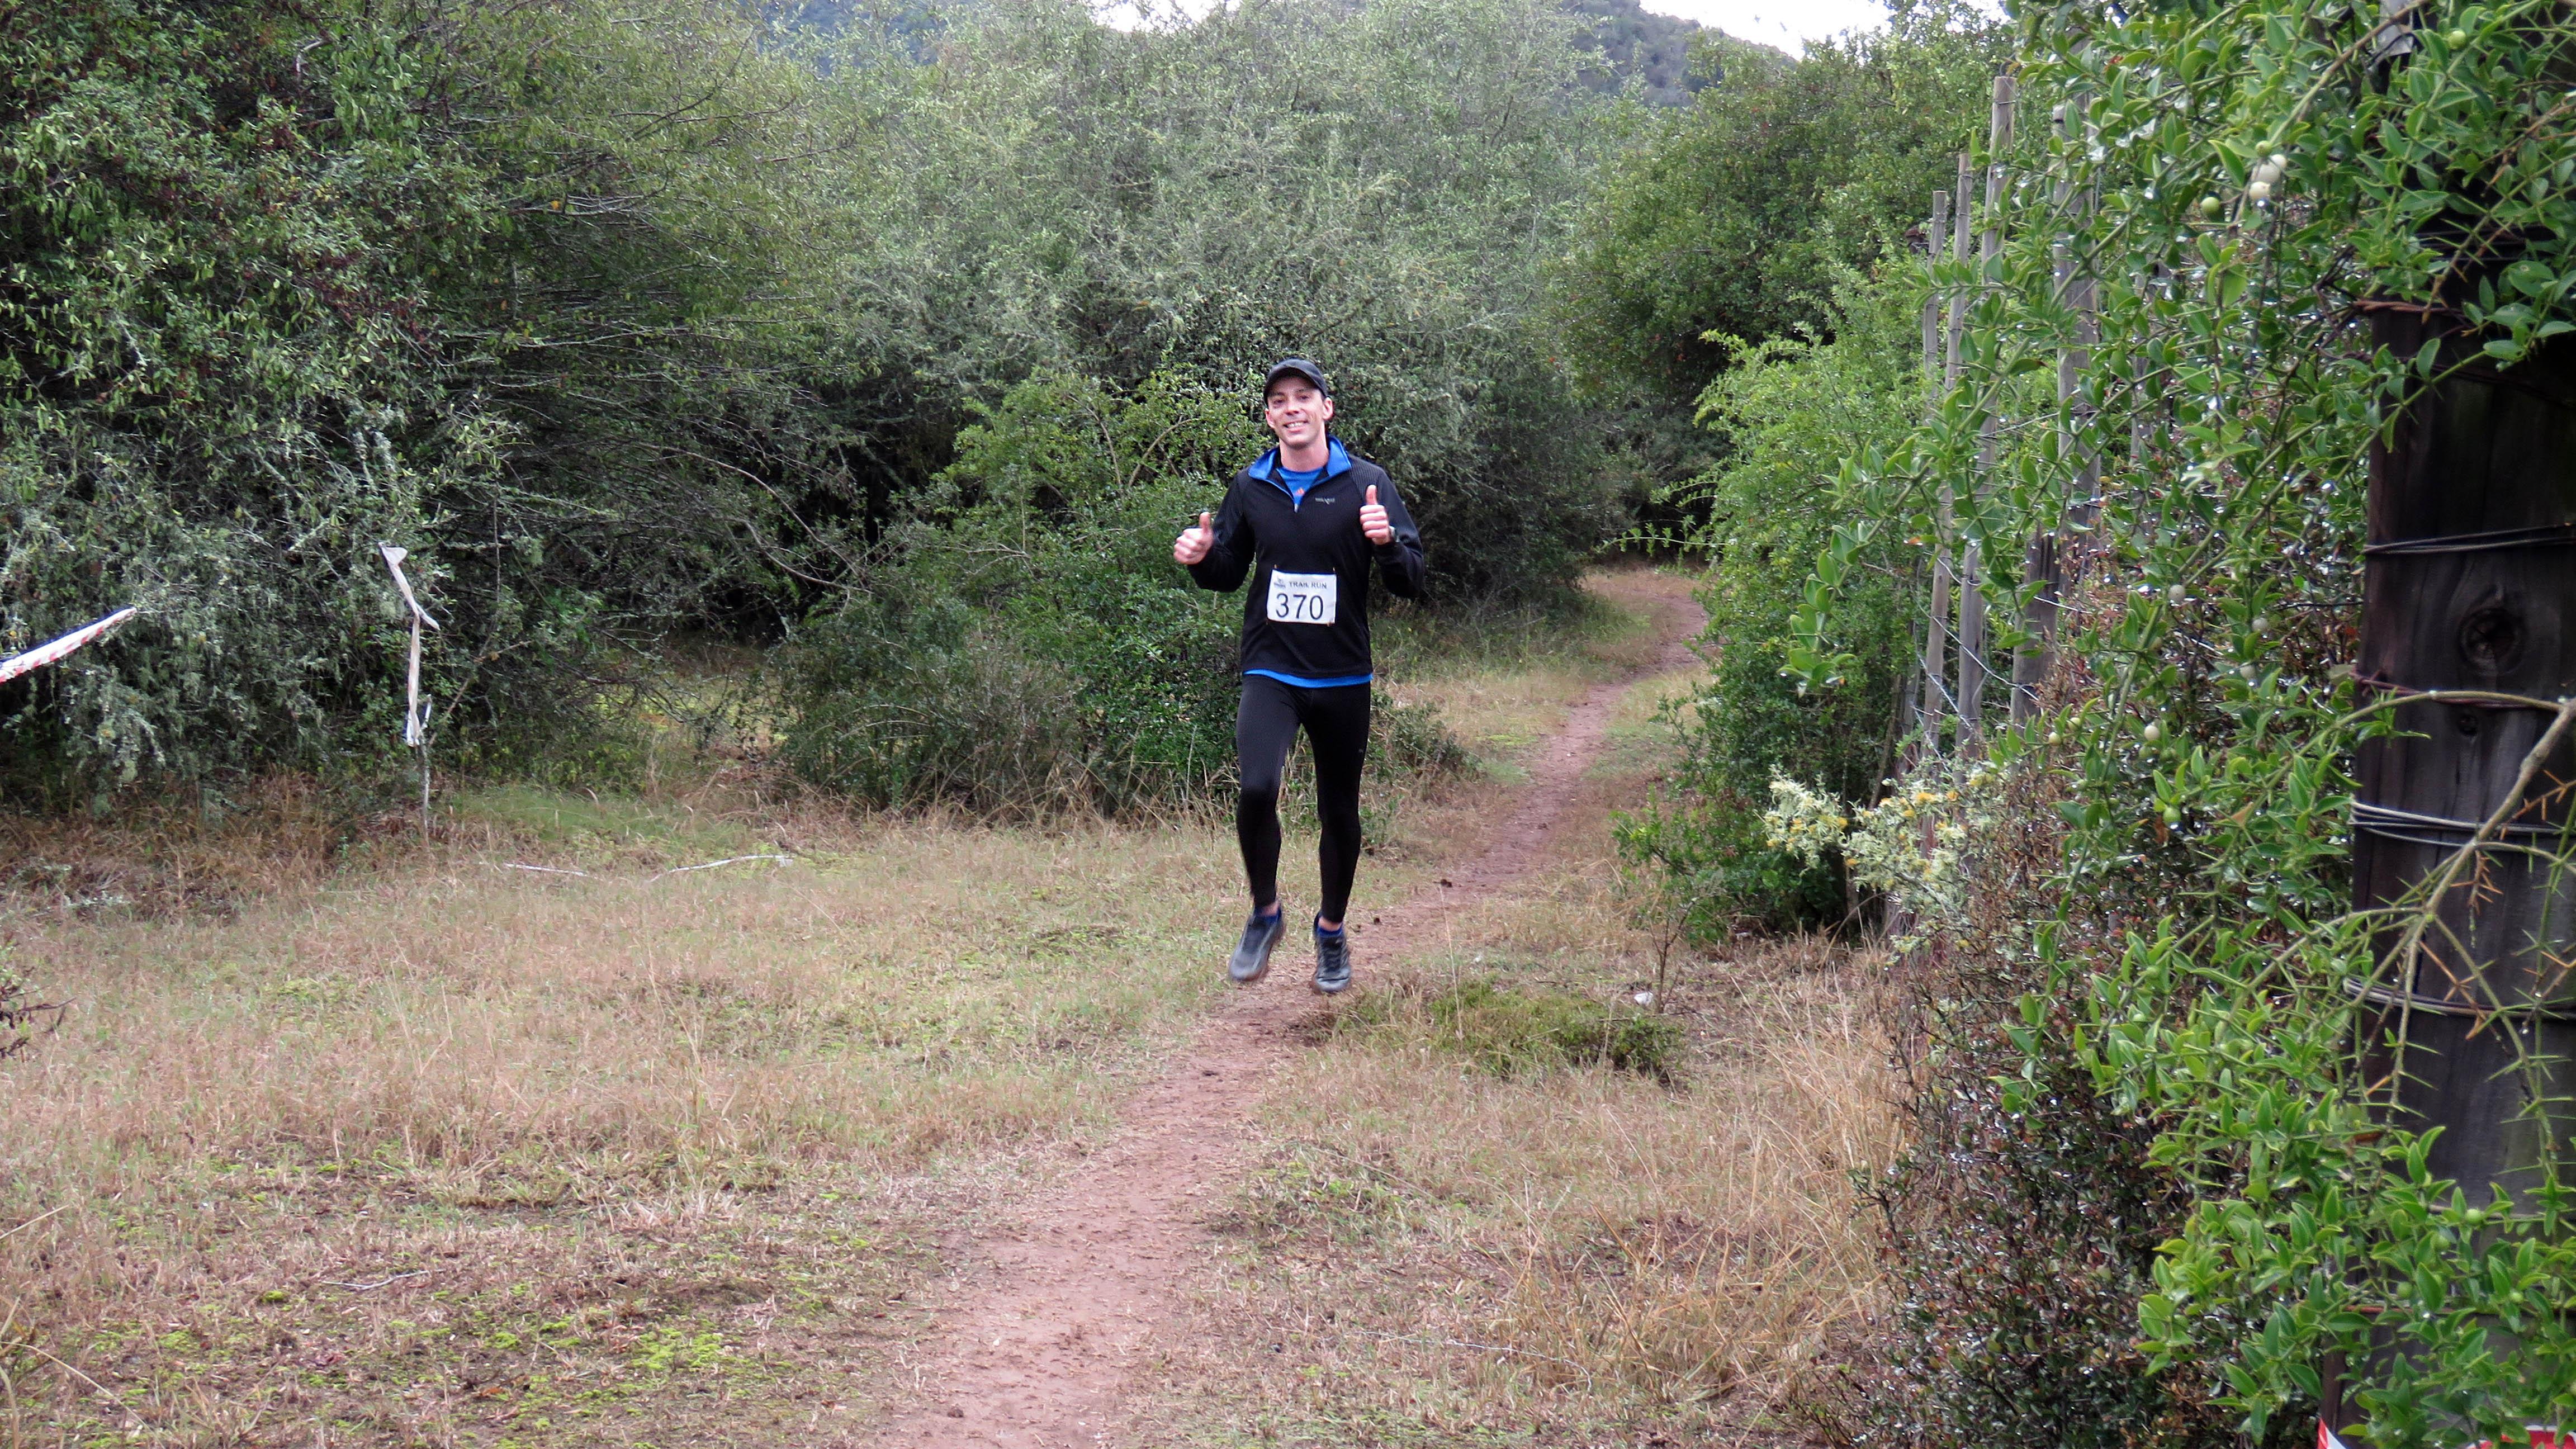 hayterdale trailrun 2018-08-05  (42)